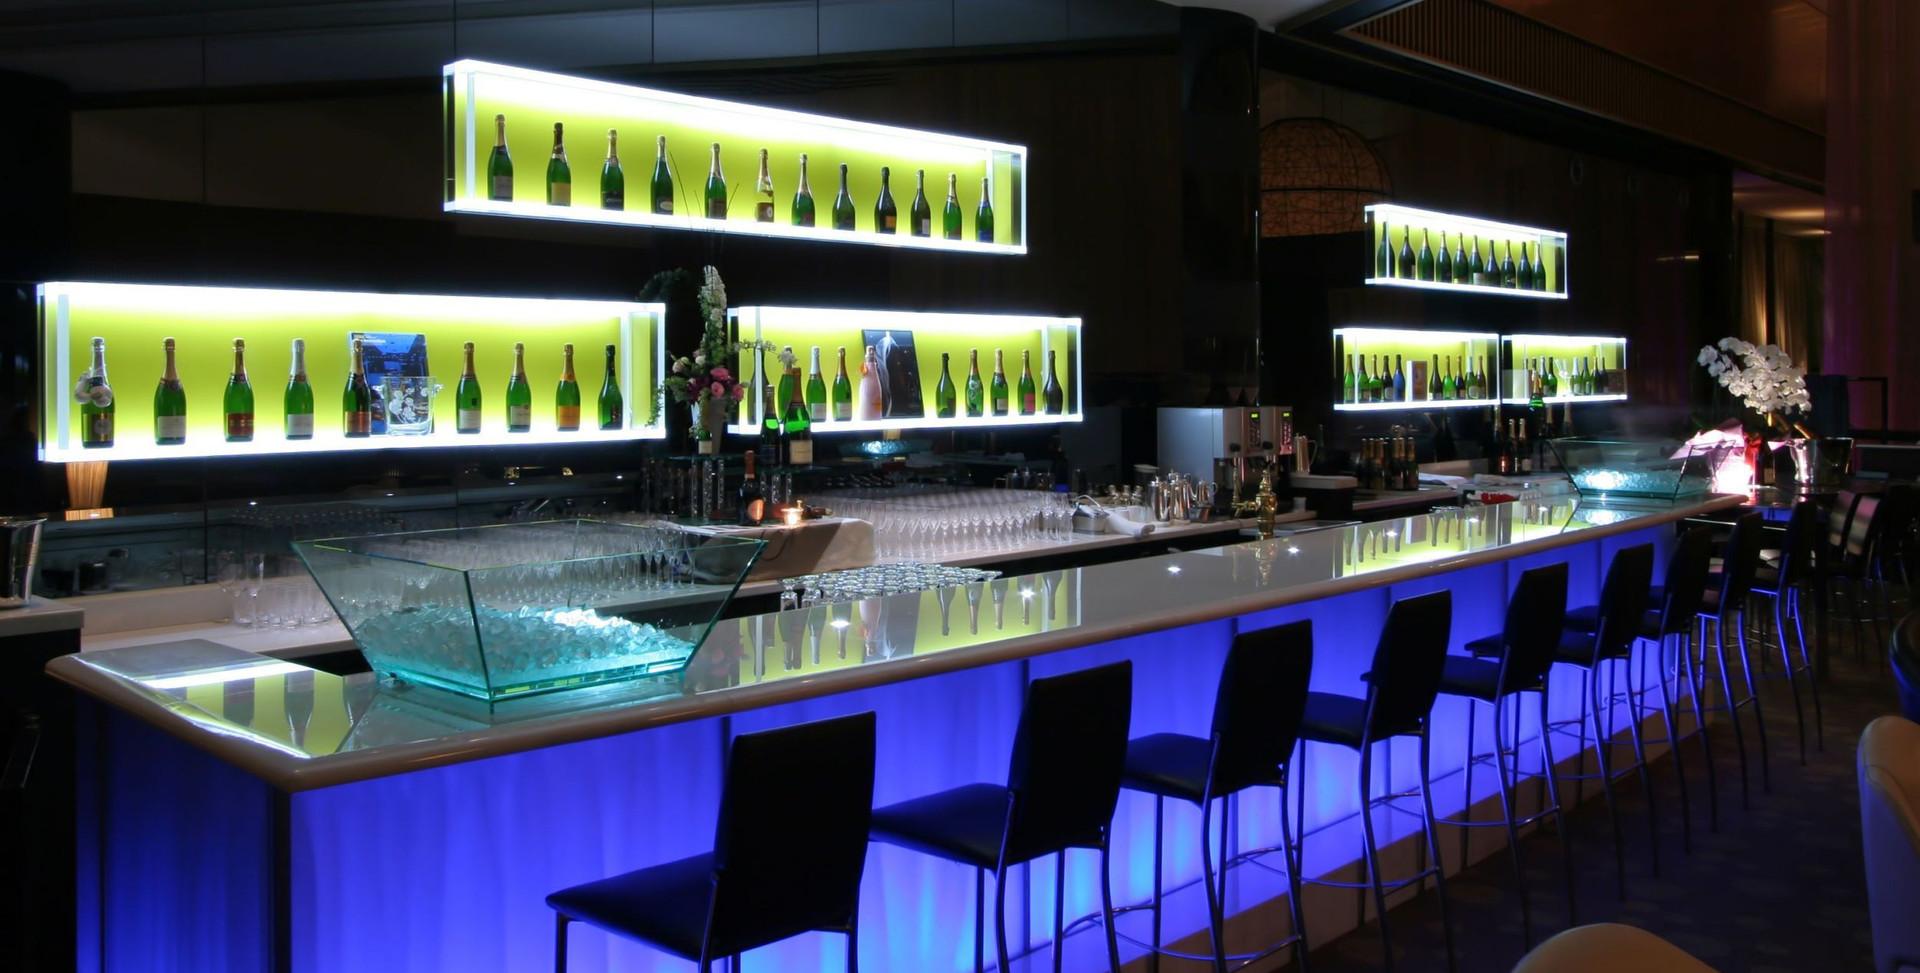 dynaled-bar-lighting-design-example-12.j